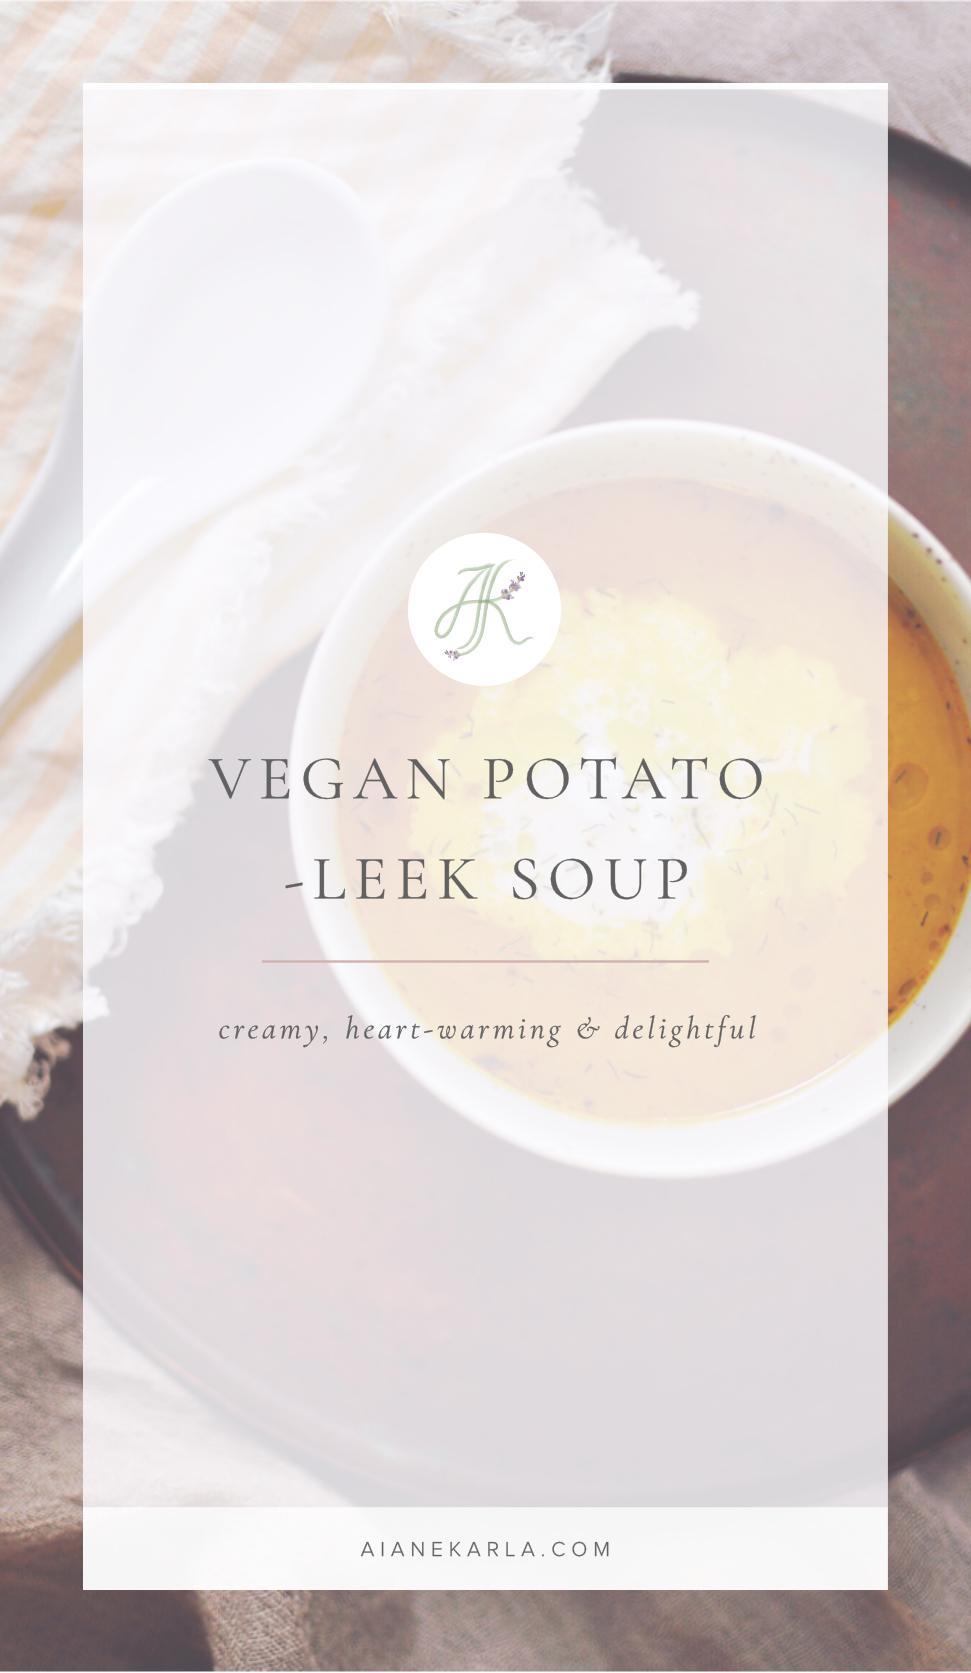 Vegan Potato Leek Soup | Aiane Karla | www.AianeKarla.com